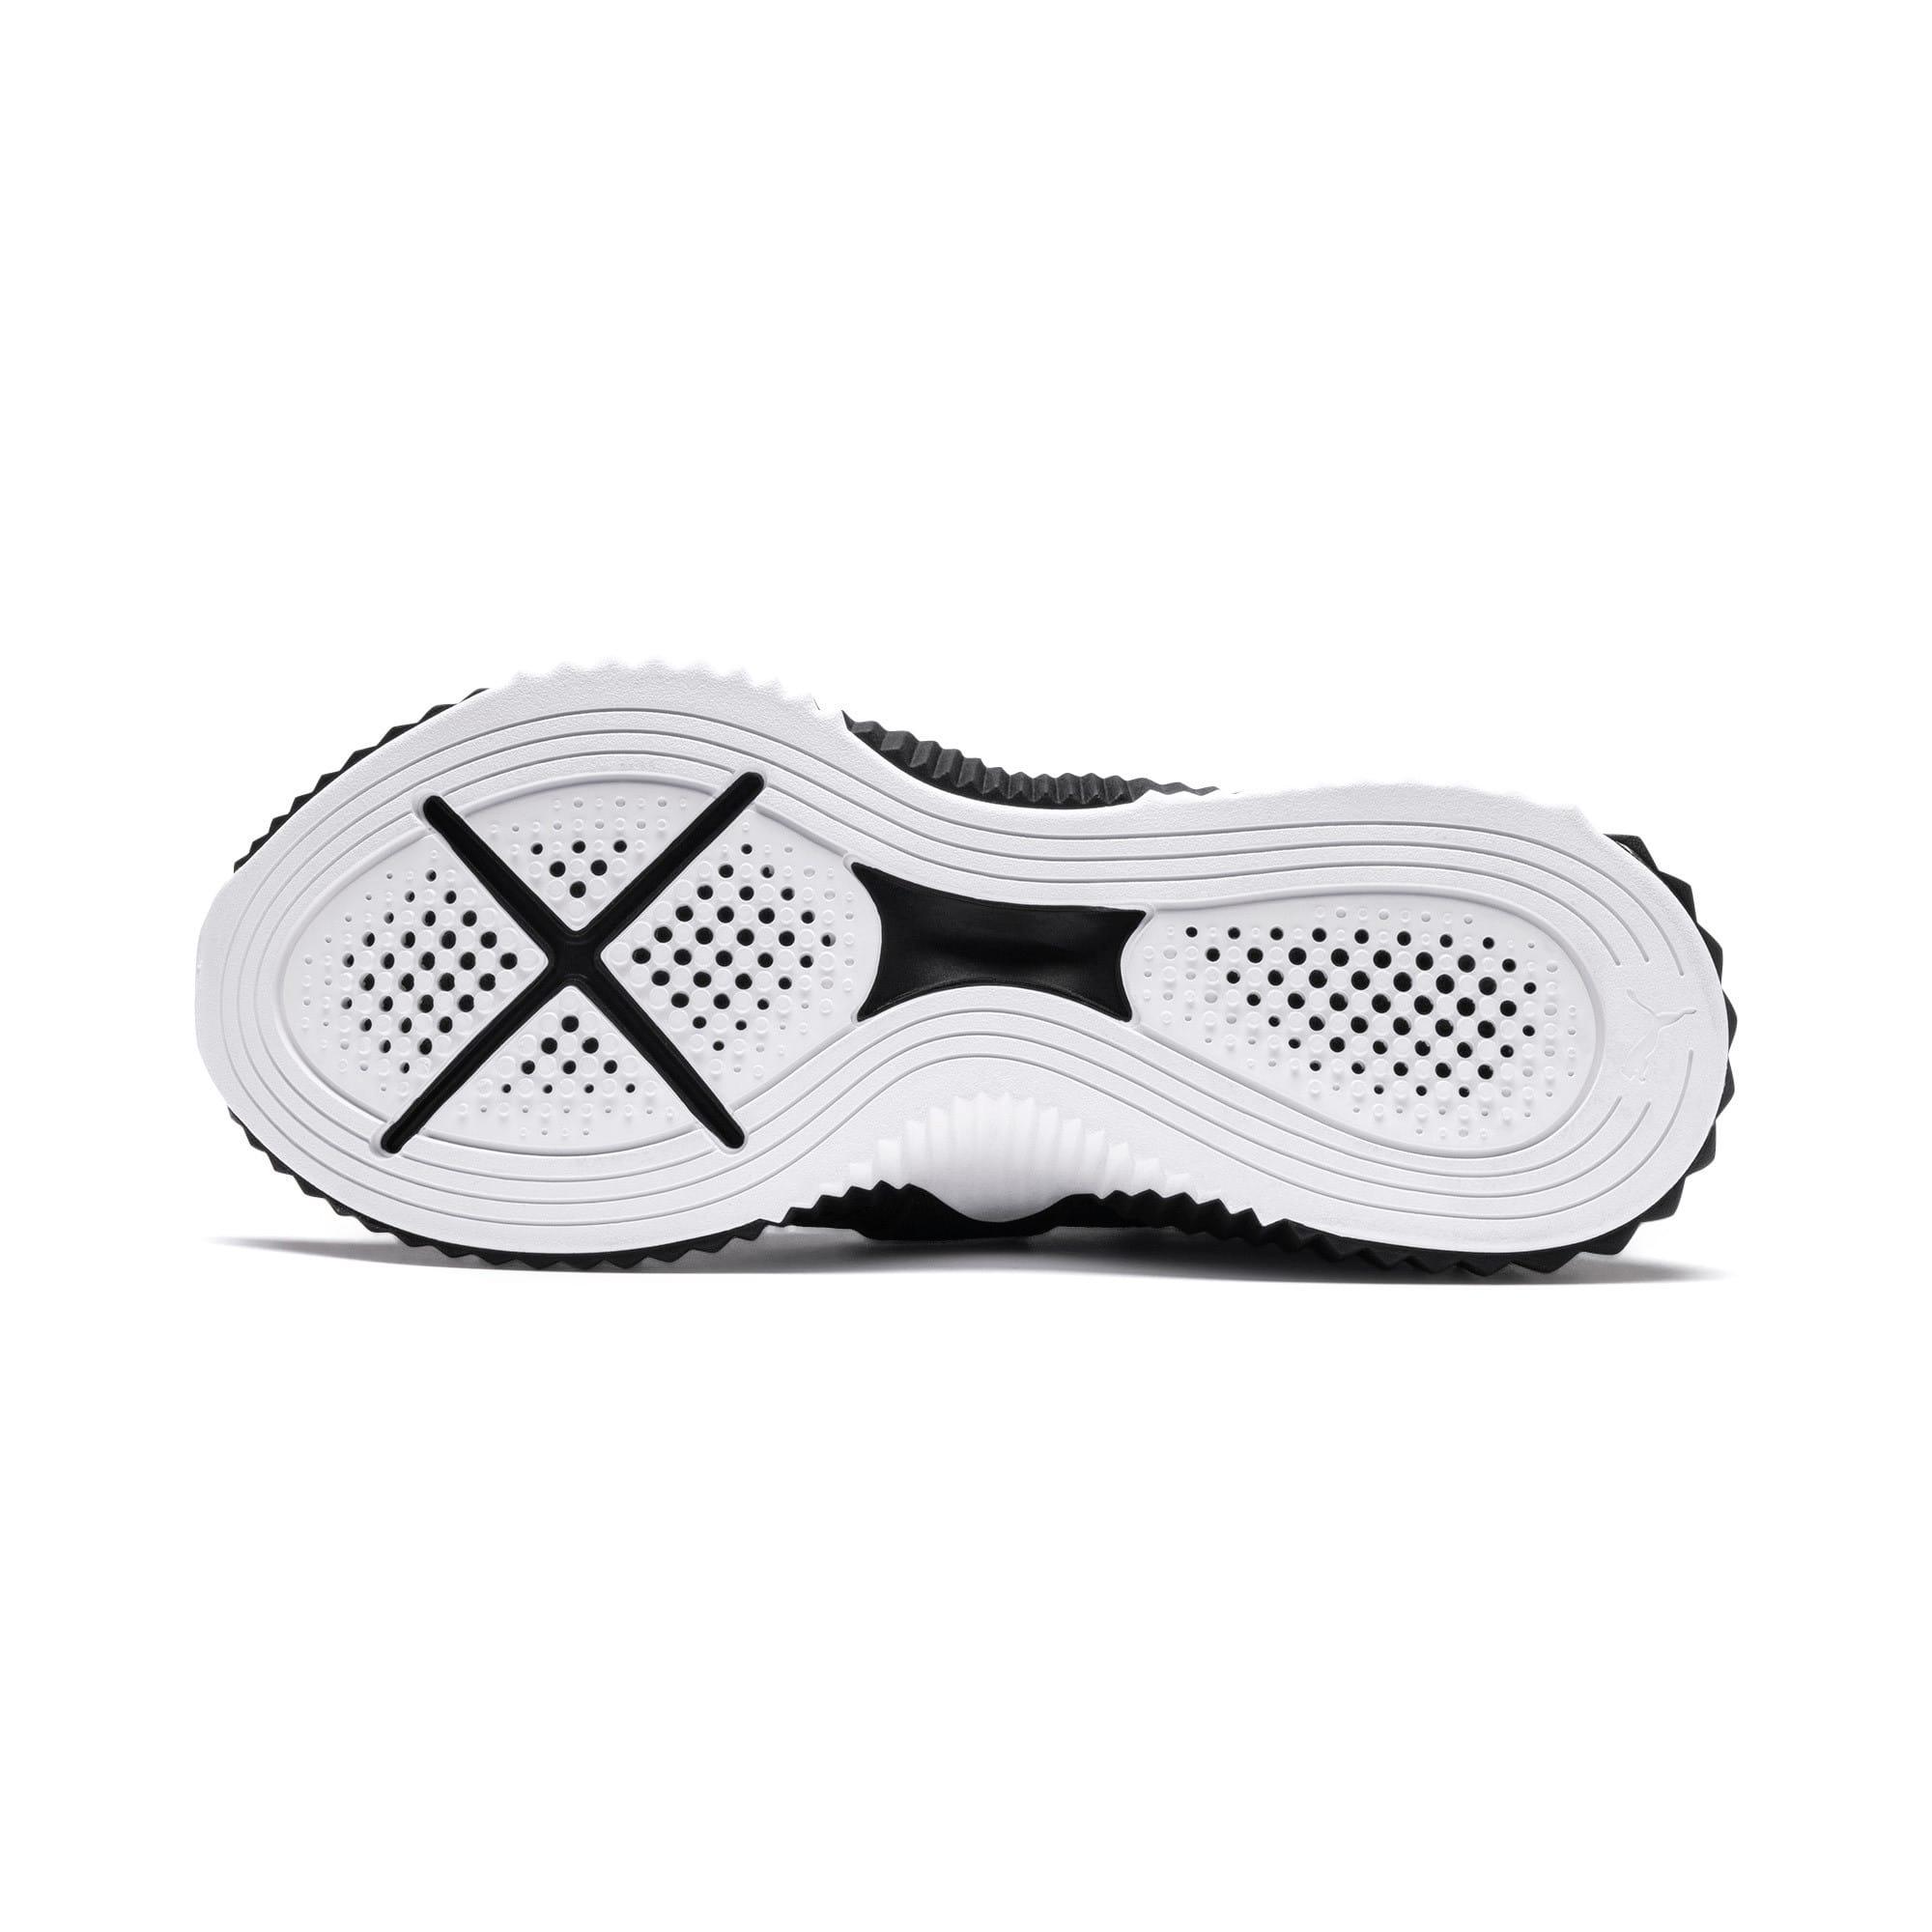 Thumbnail 5 of Defy Mid Core Women's Training Shoes, Puma Black-Puma White, medium